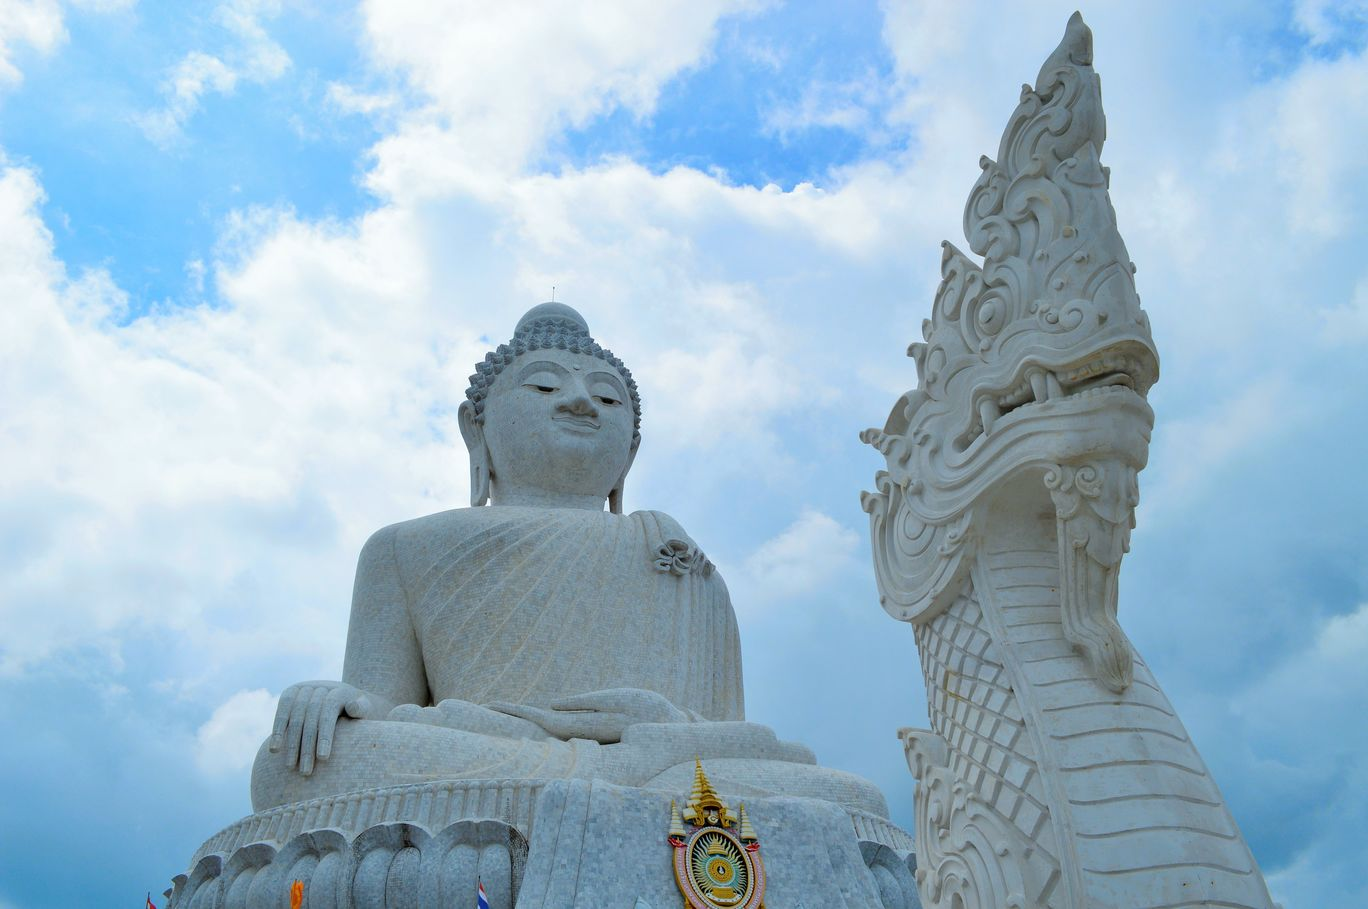 Photo of Big Buddha By Khushboo Bhambri